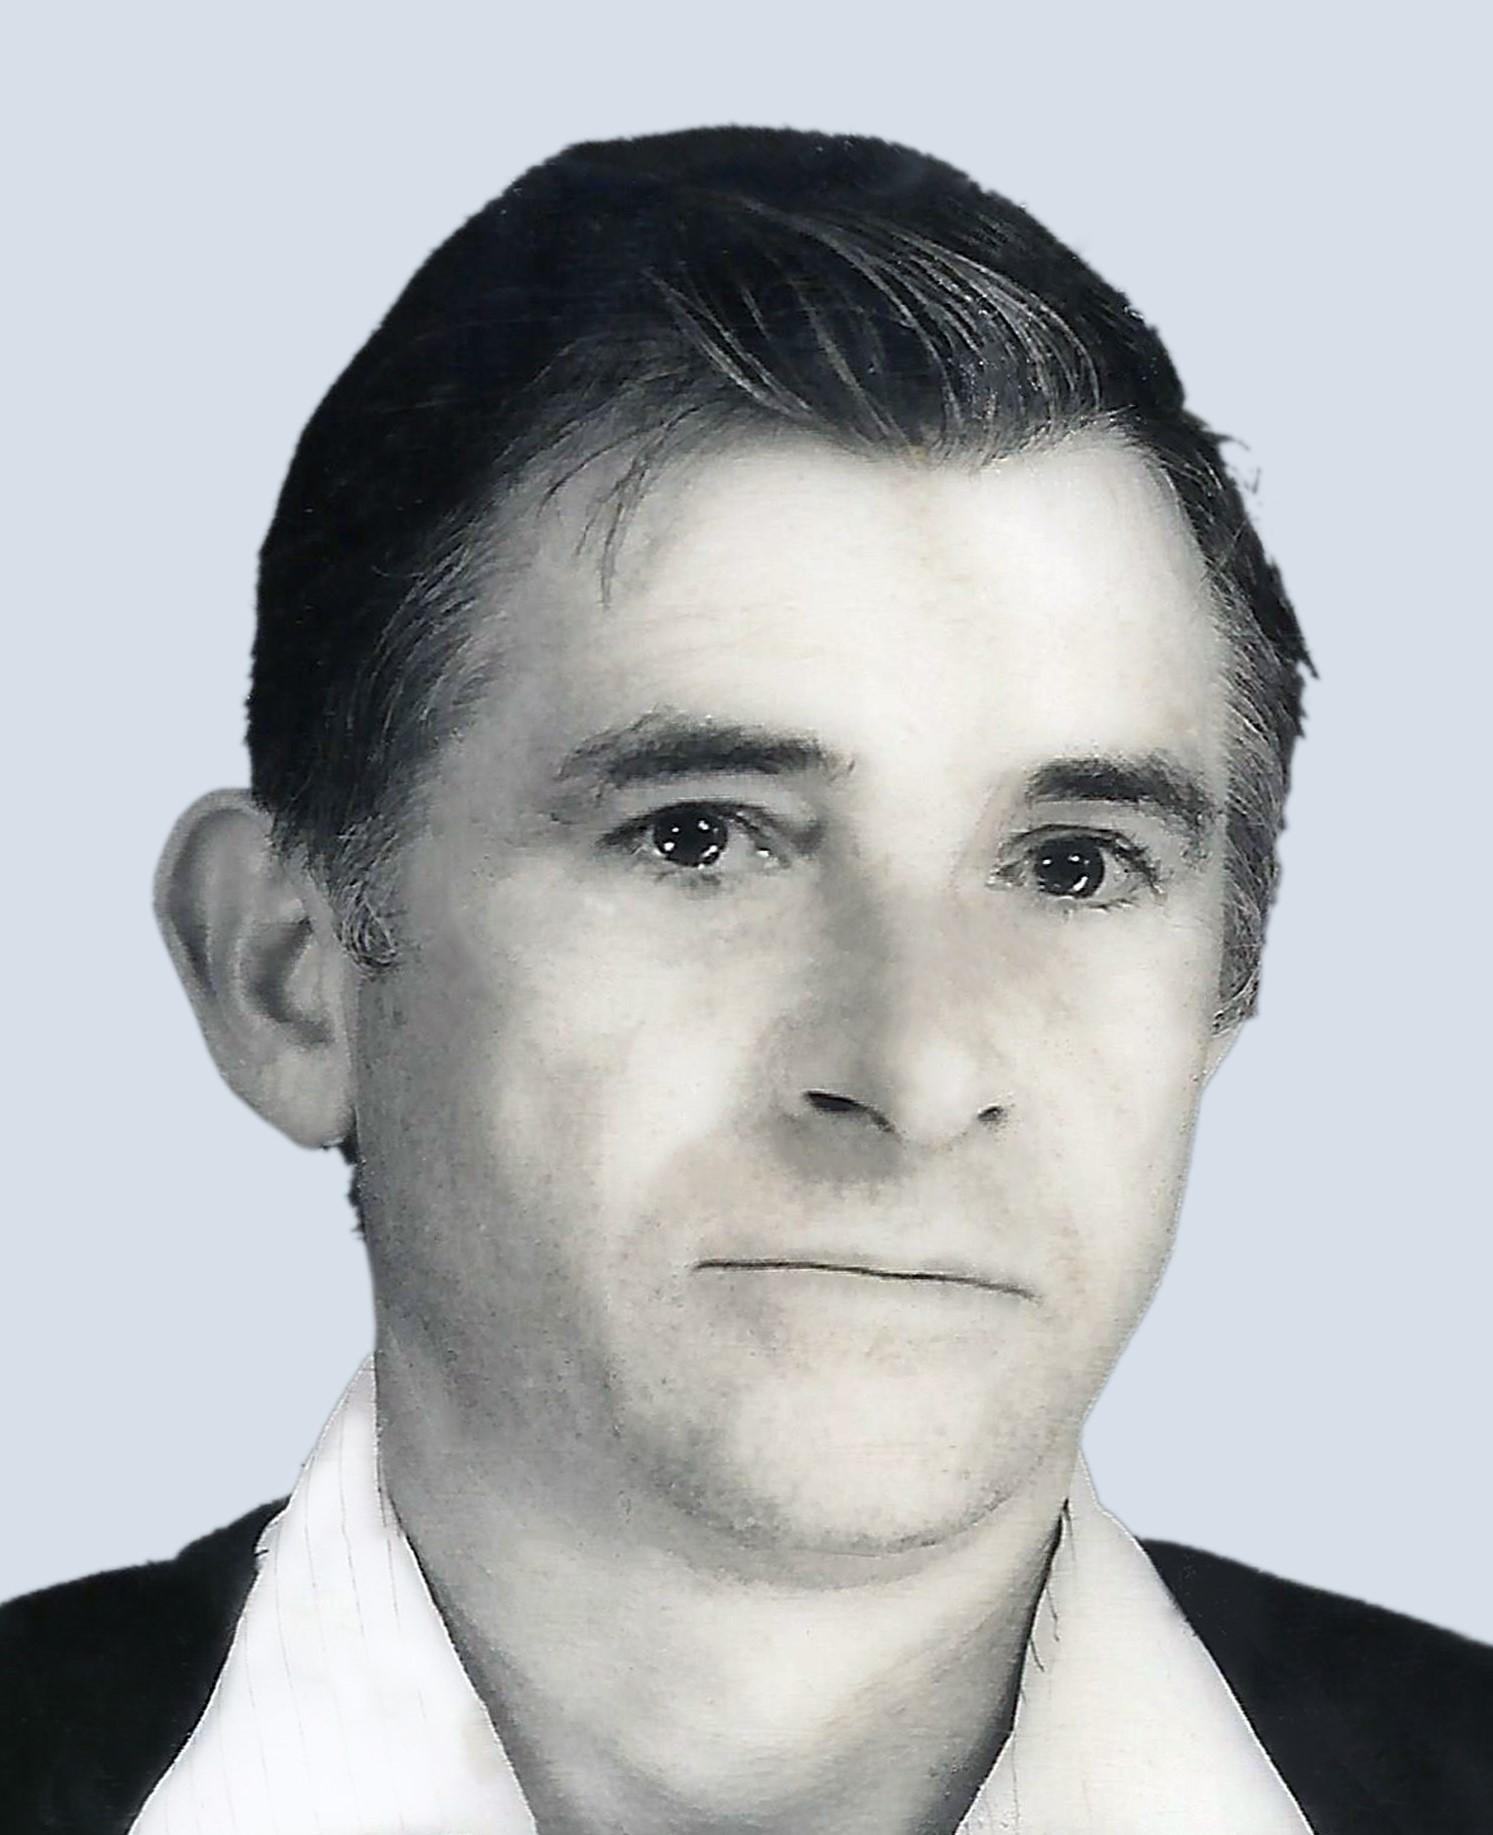 ALBINO RODRIGUES CALDEIRA